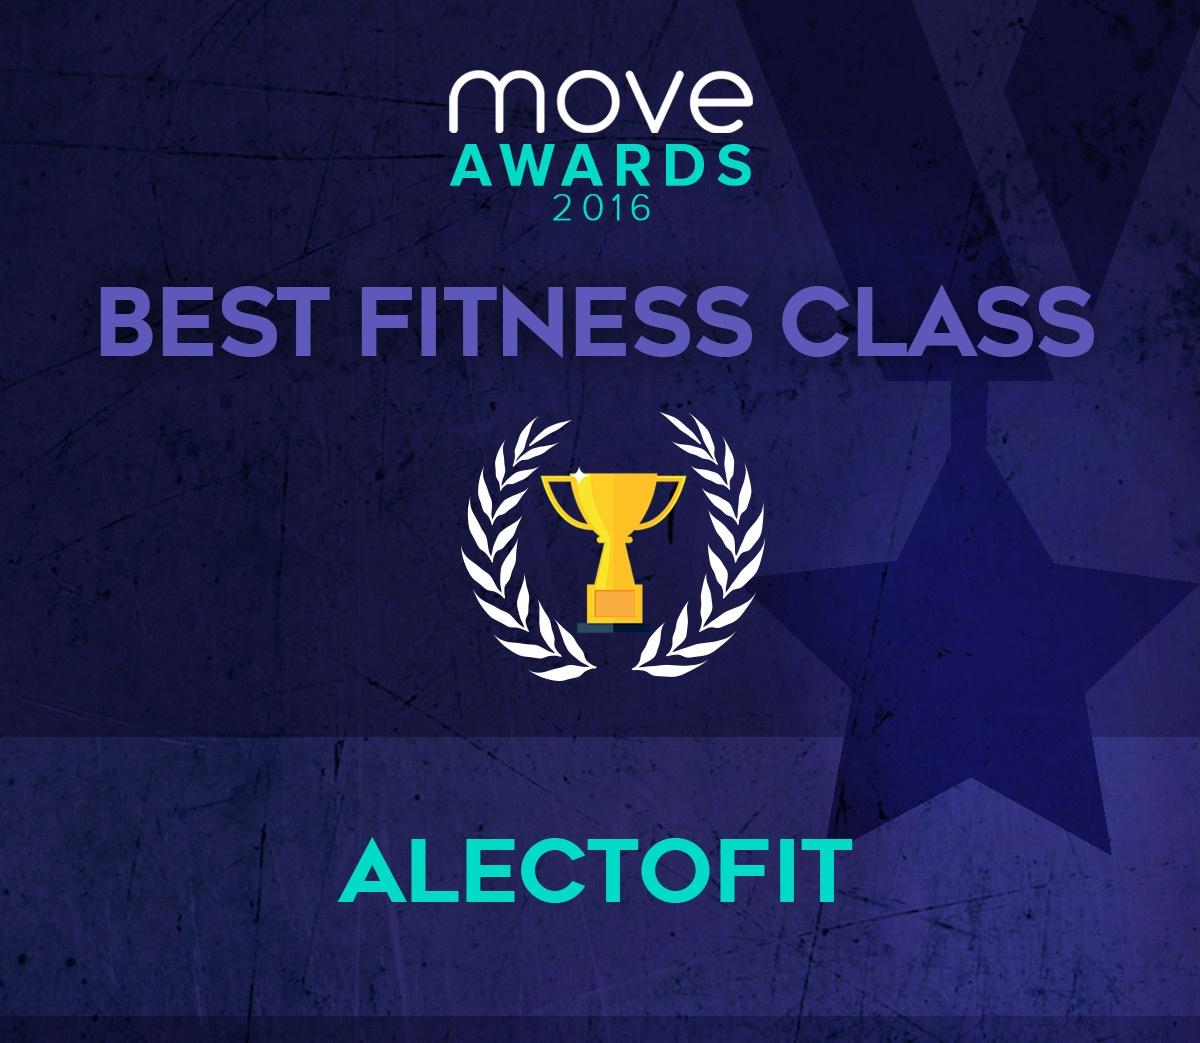 Best-Fitness-Class-Southampton.jpg